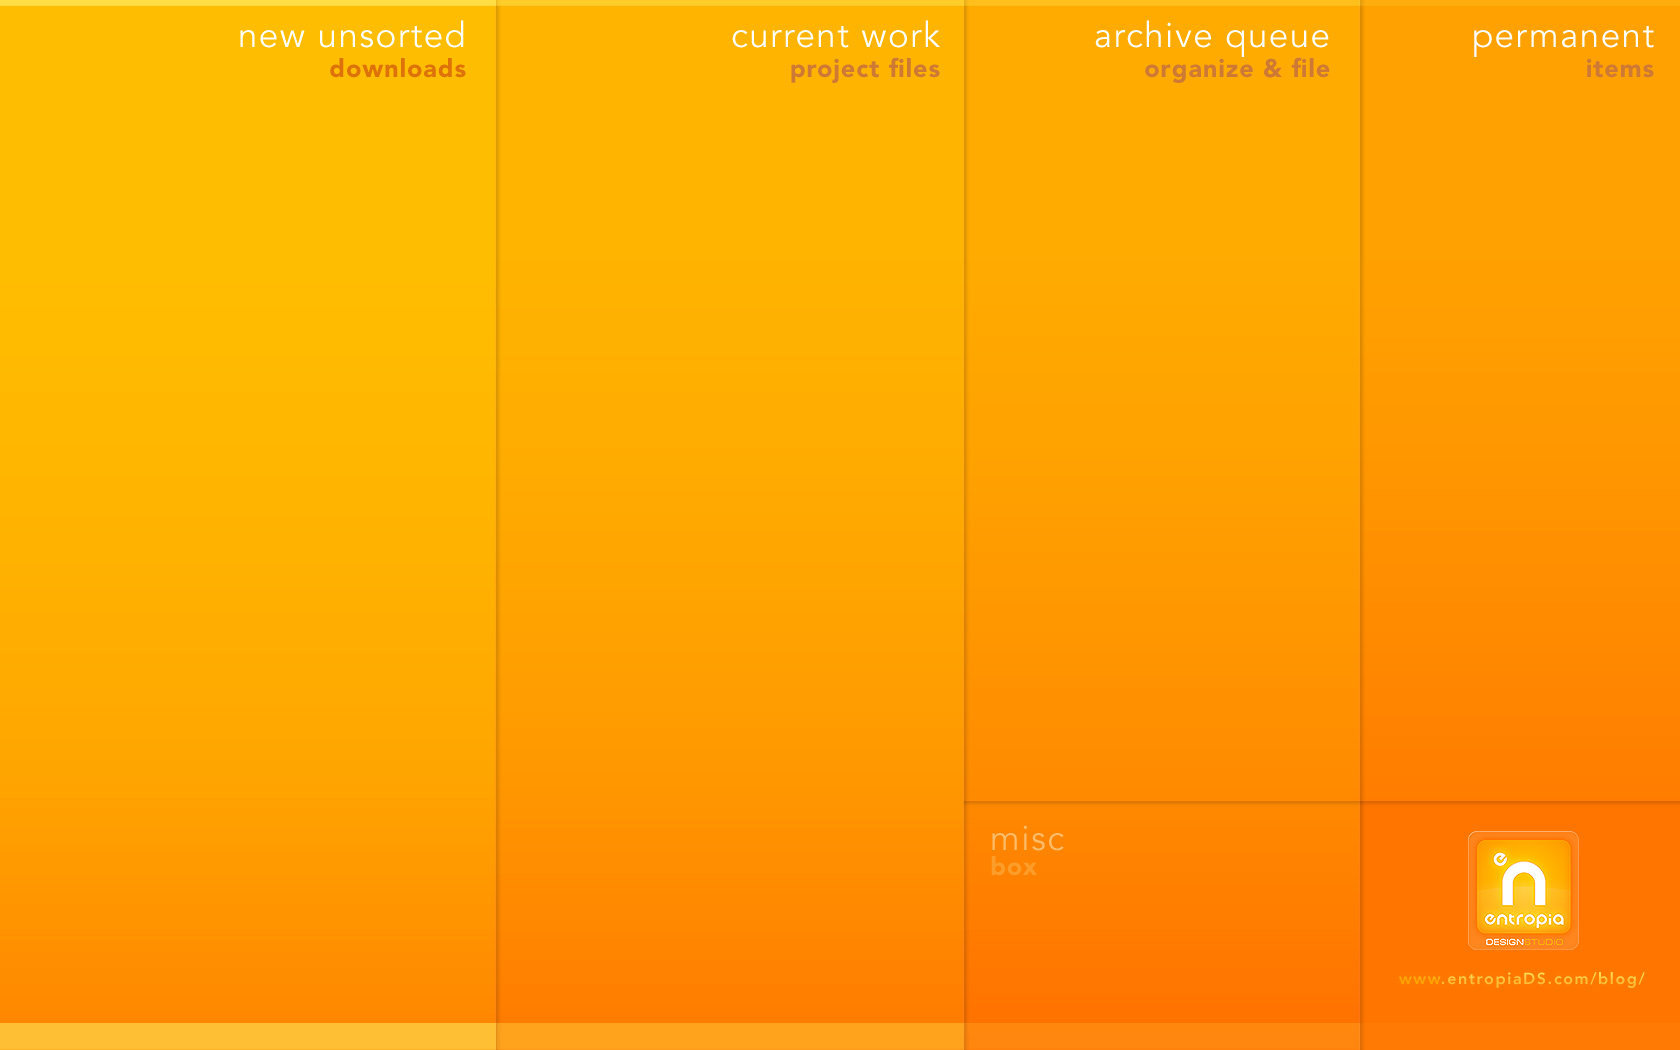 httpfilescustomizeorgdownloadwallpapers7219777295desktop 1680x1050